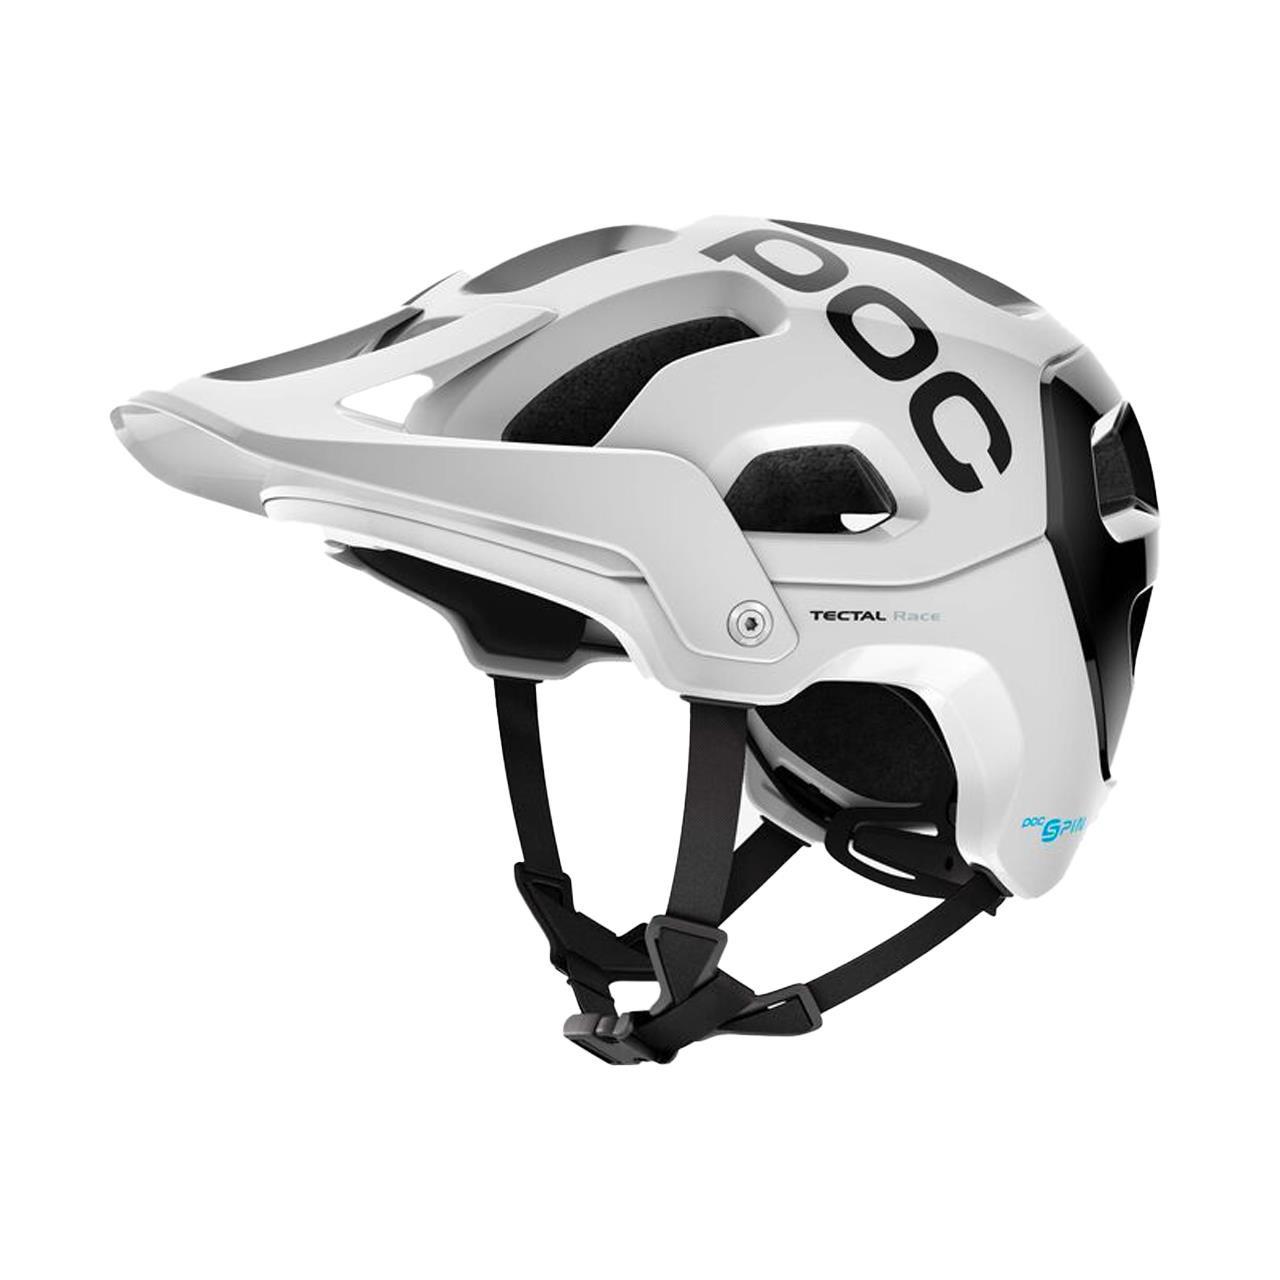 POC Unisex's Tectal Race Cycling Helmet - White/Uranium Black